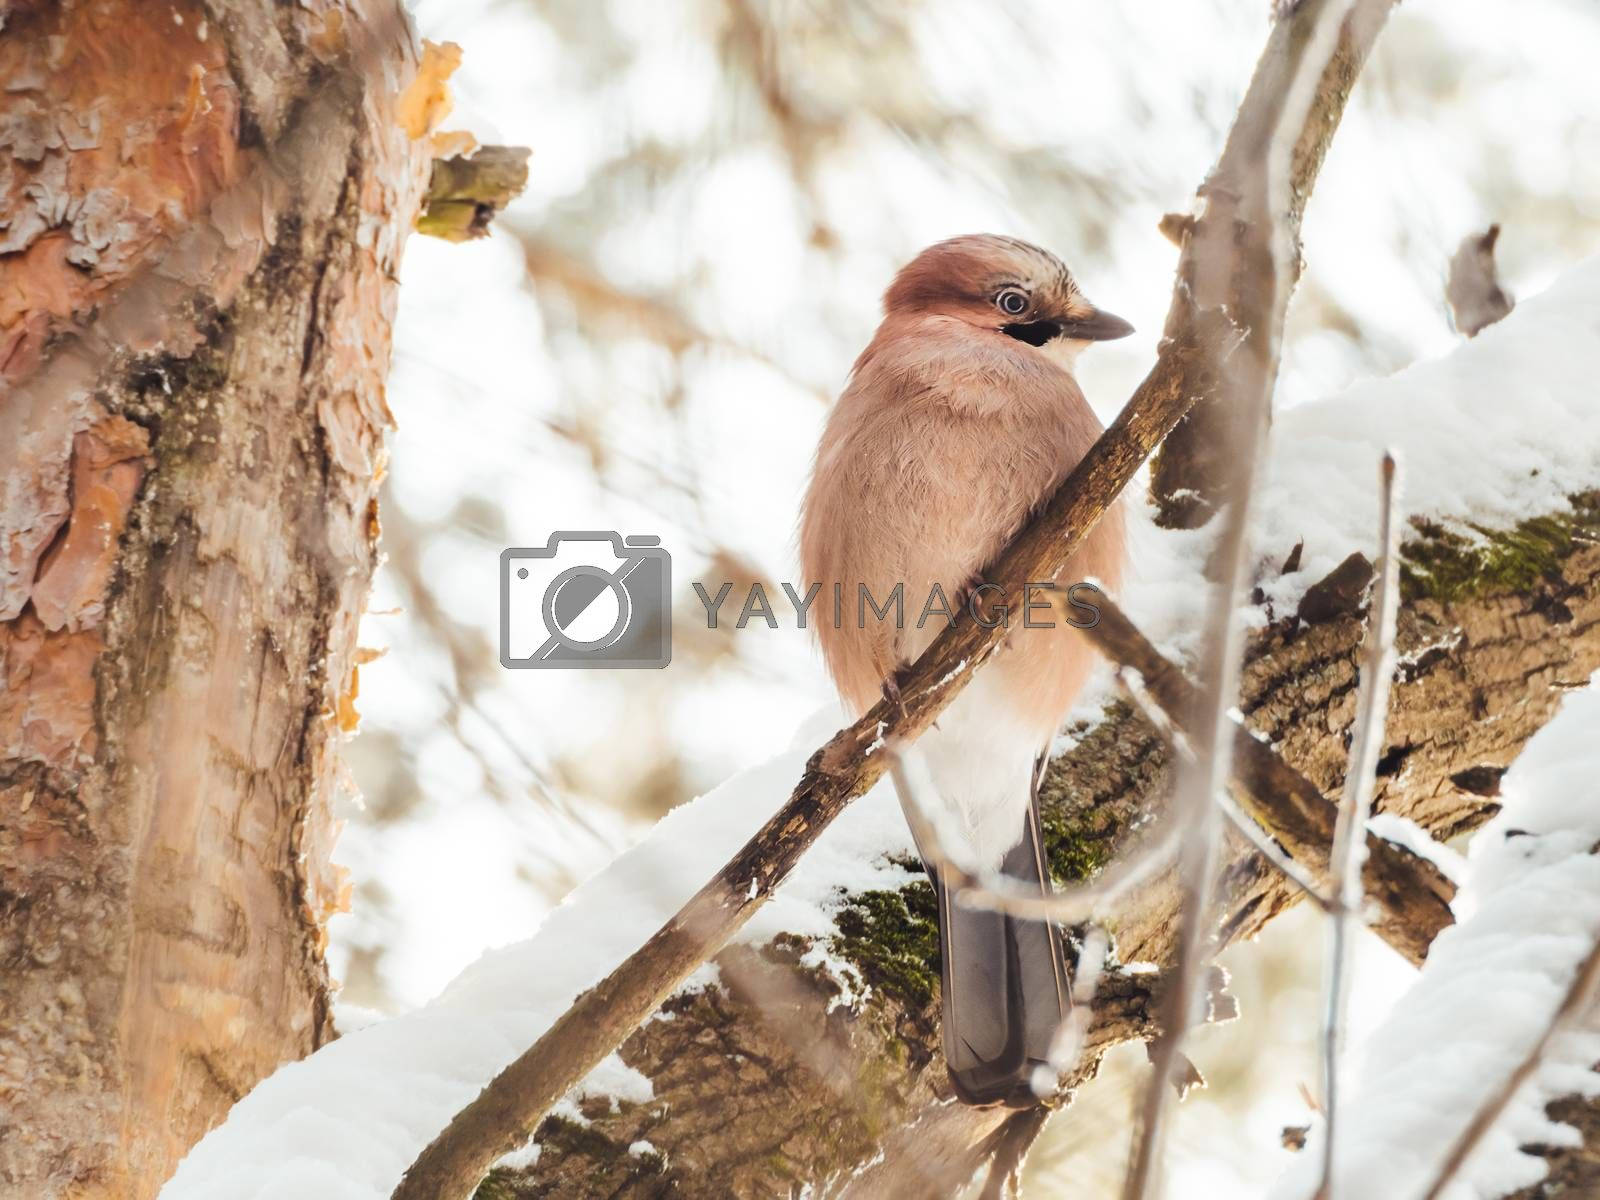 Eurasian jay or Garrulus glandarius is sitting on fir tree branch. Colorful bird in winter forest.